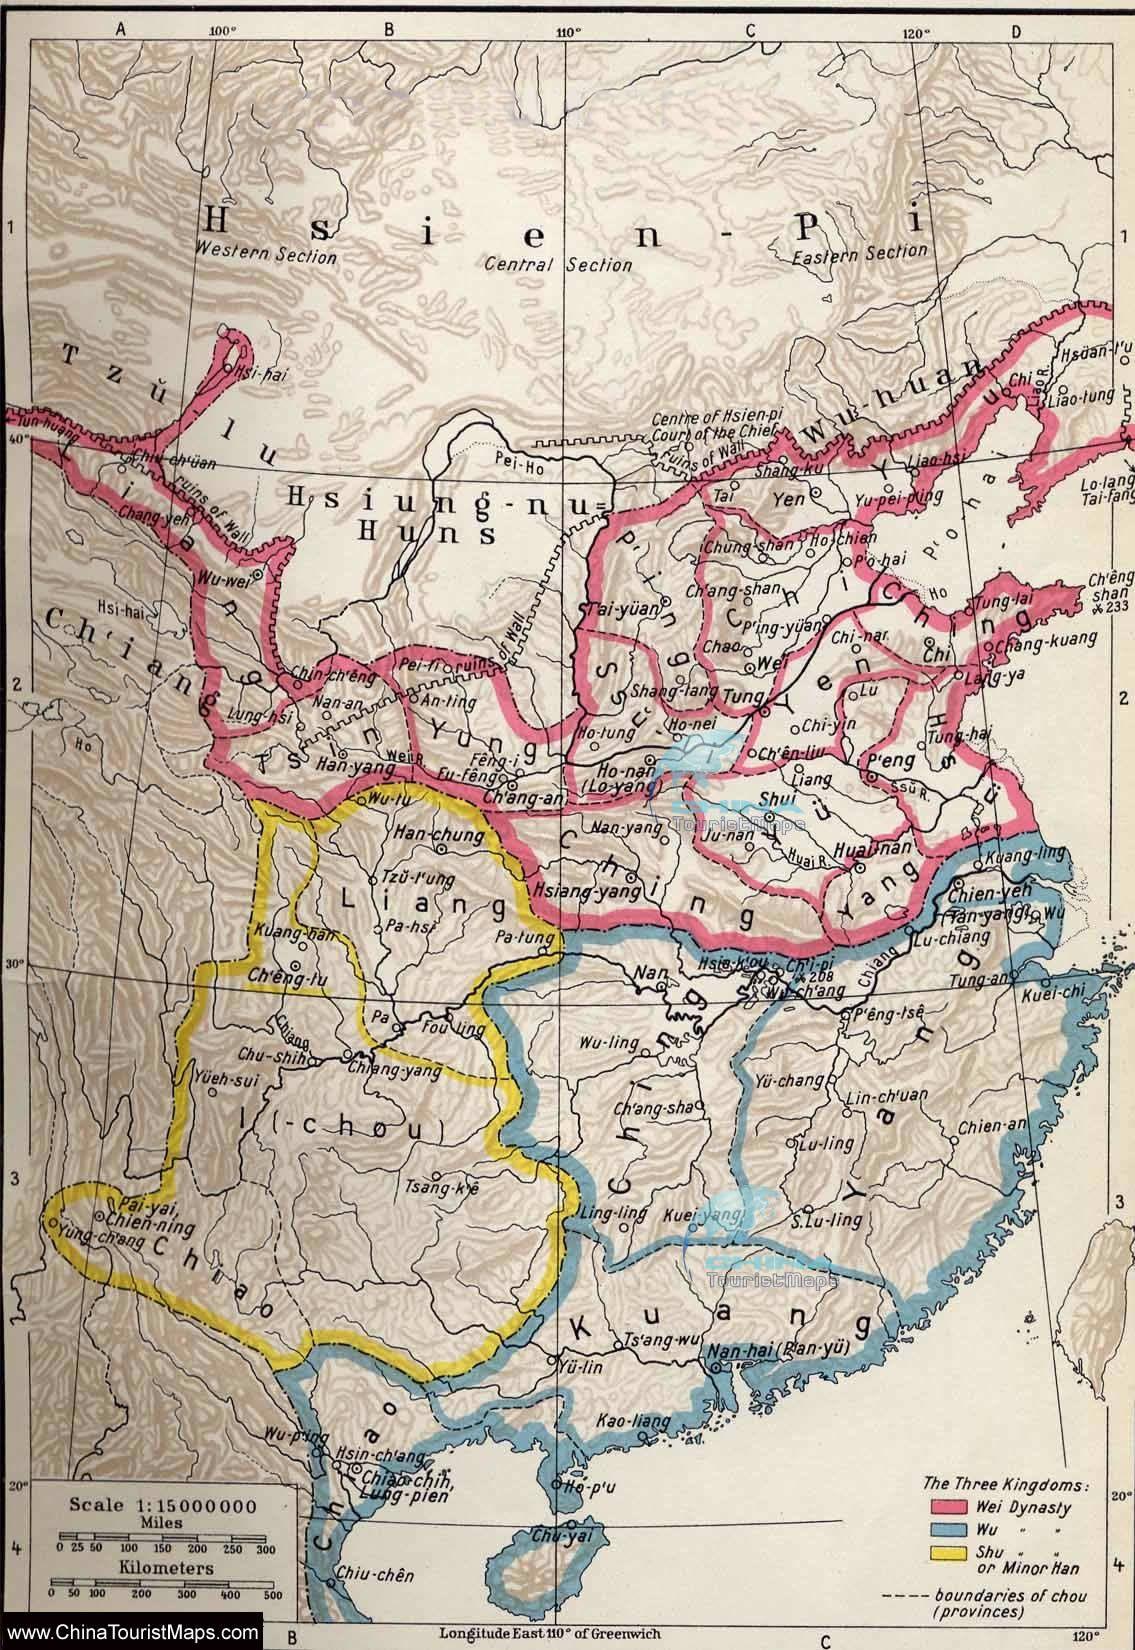 Three kingdoms of china map chinese history pinterest third 99ef57c87959f17e345133fa9ec47fa7g gumiabroncs Images